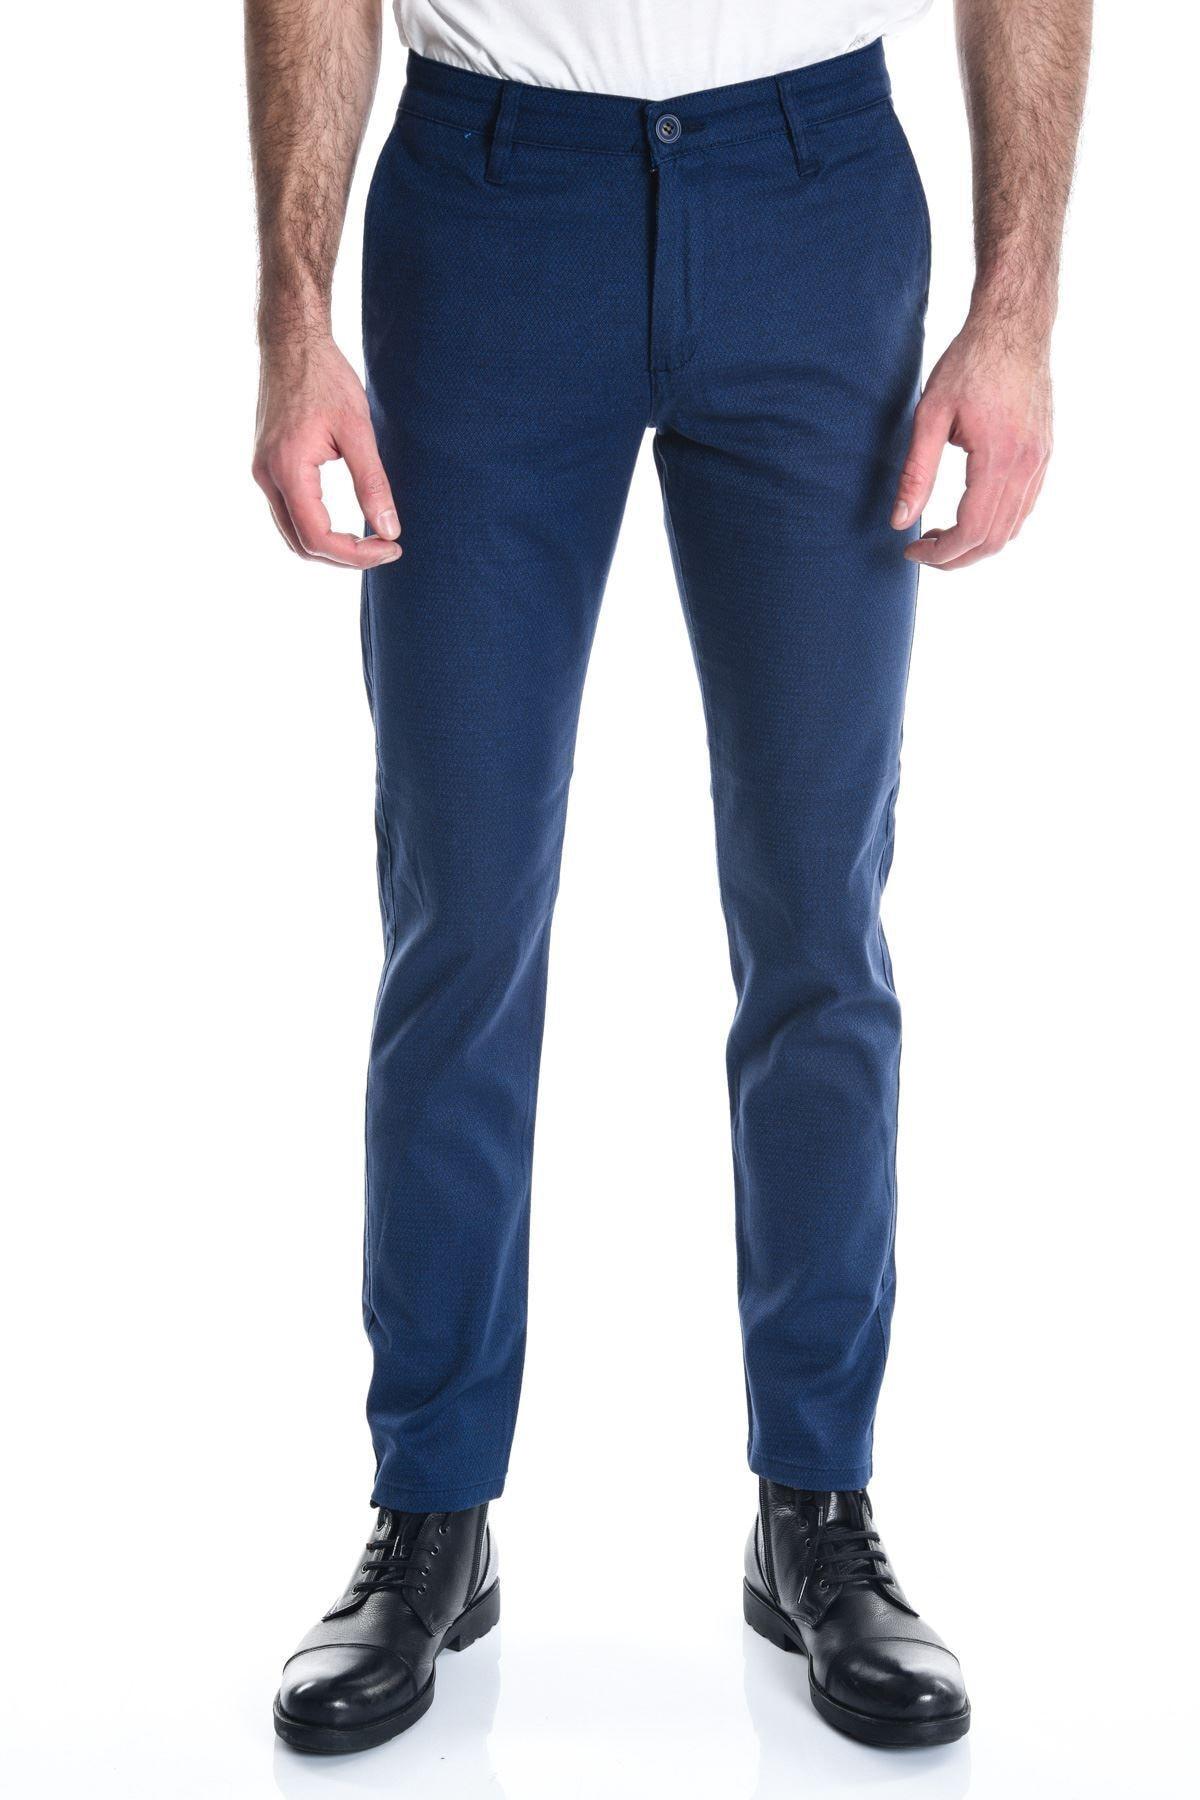 LTC Jeans Lacivert Desenli Armürlü Chino Erkek Pantolon 1